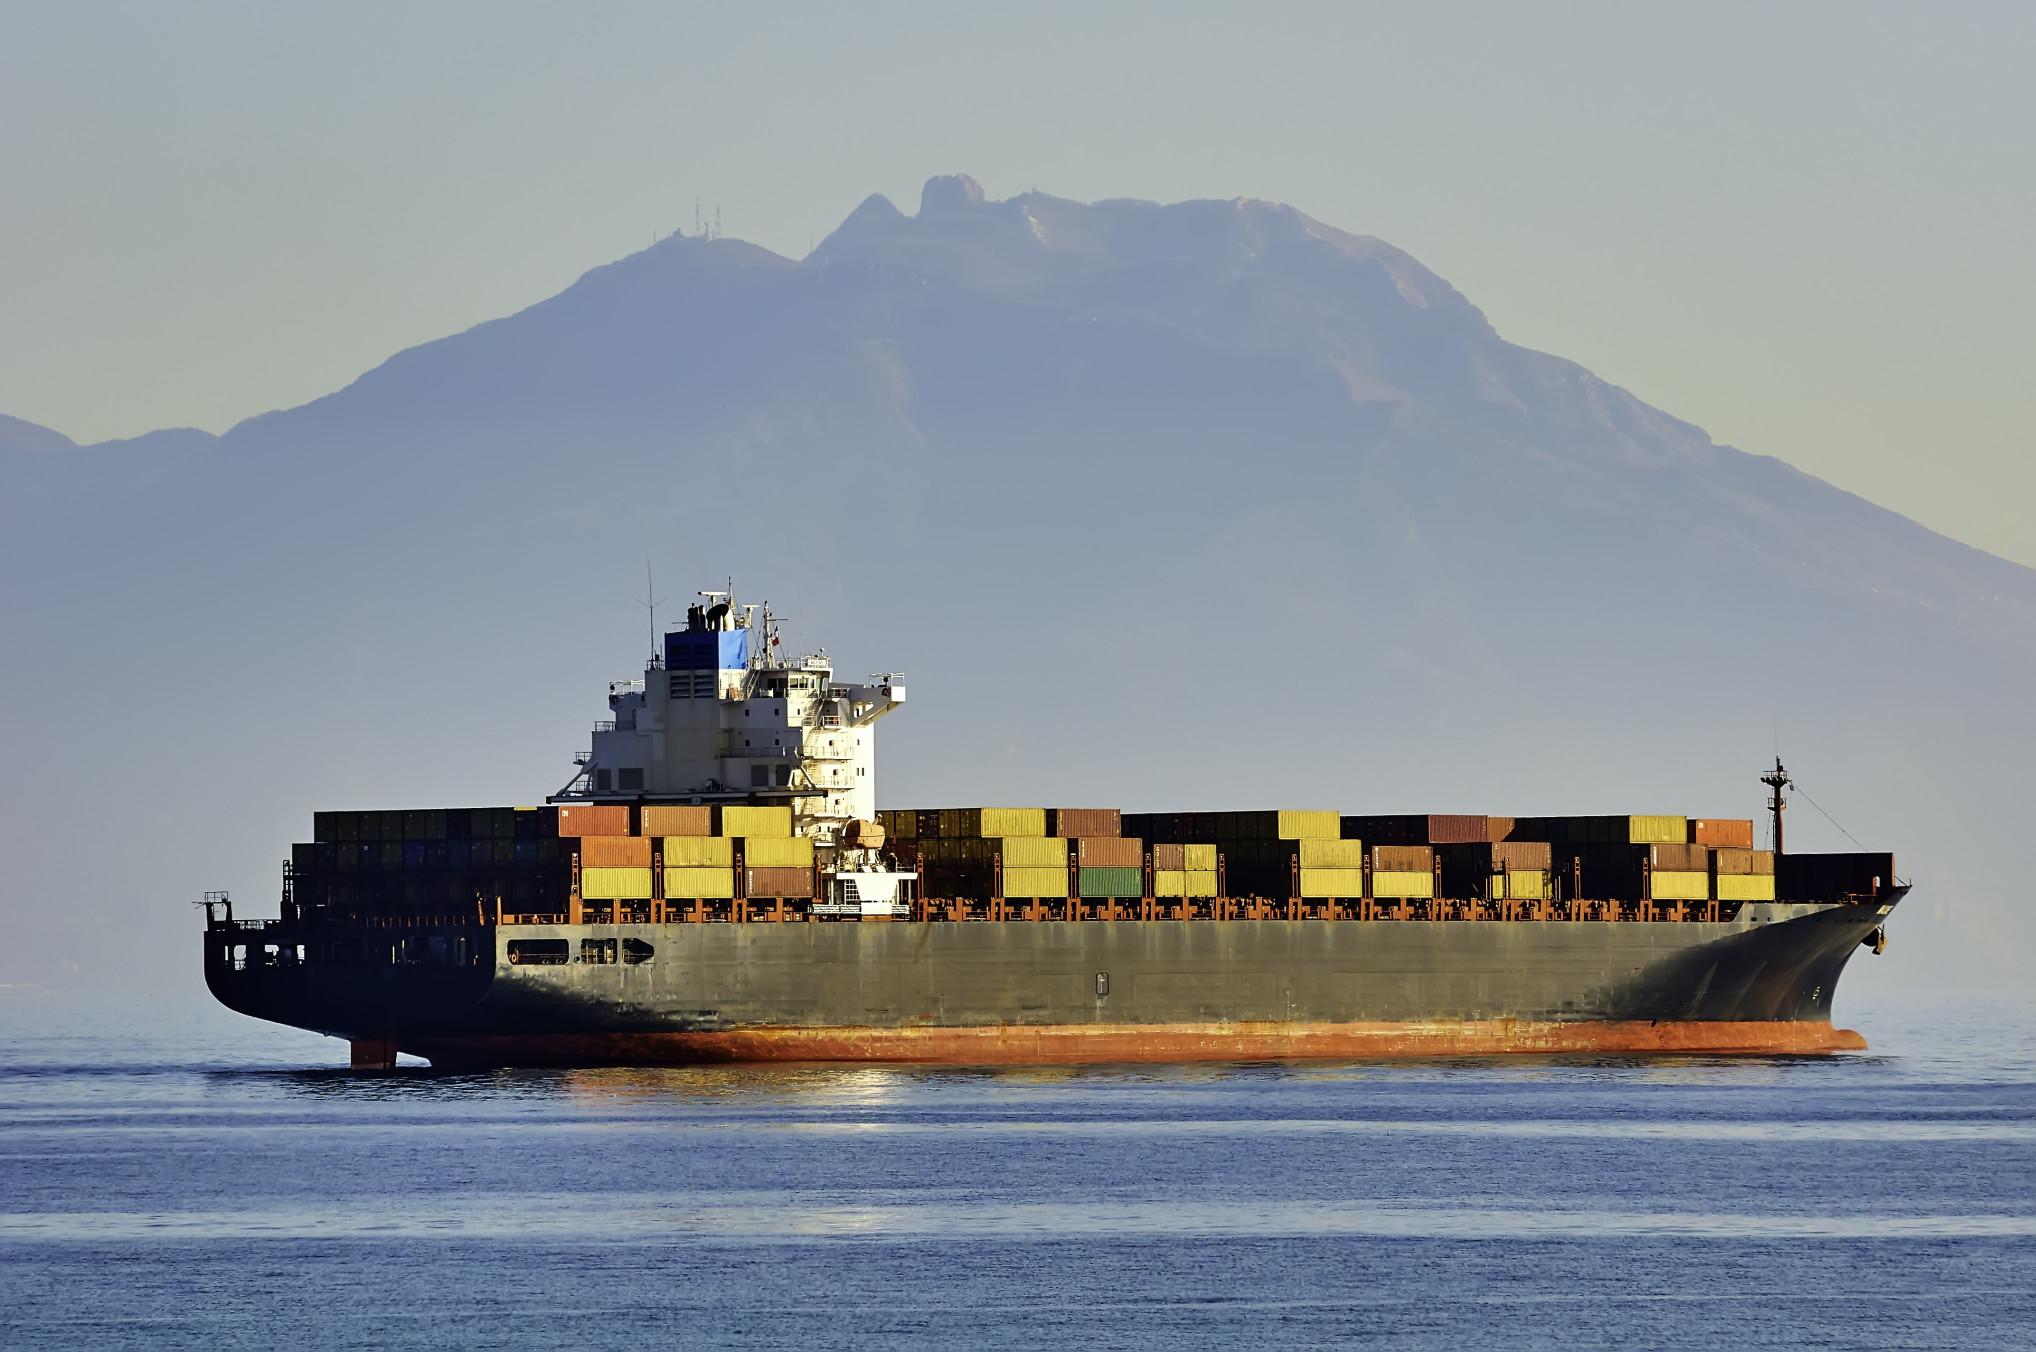 container-ship-in-the-sea_t20_v3AGlE.jpg